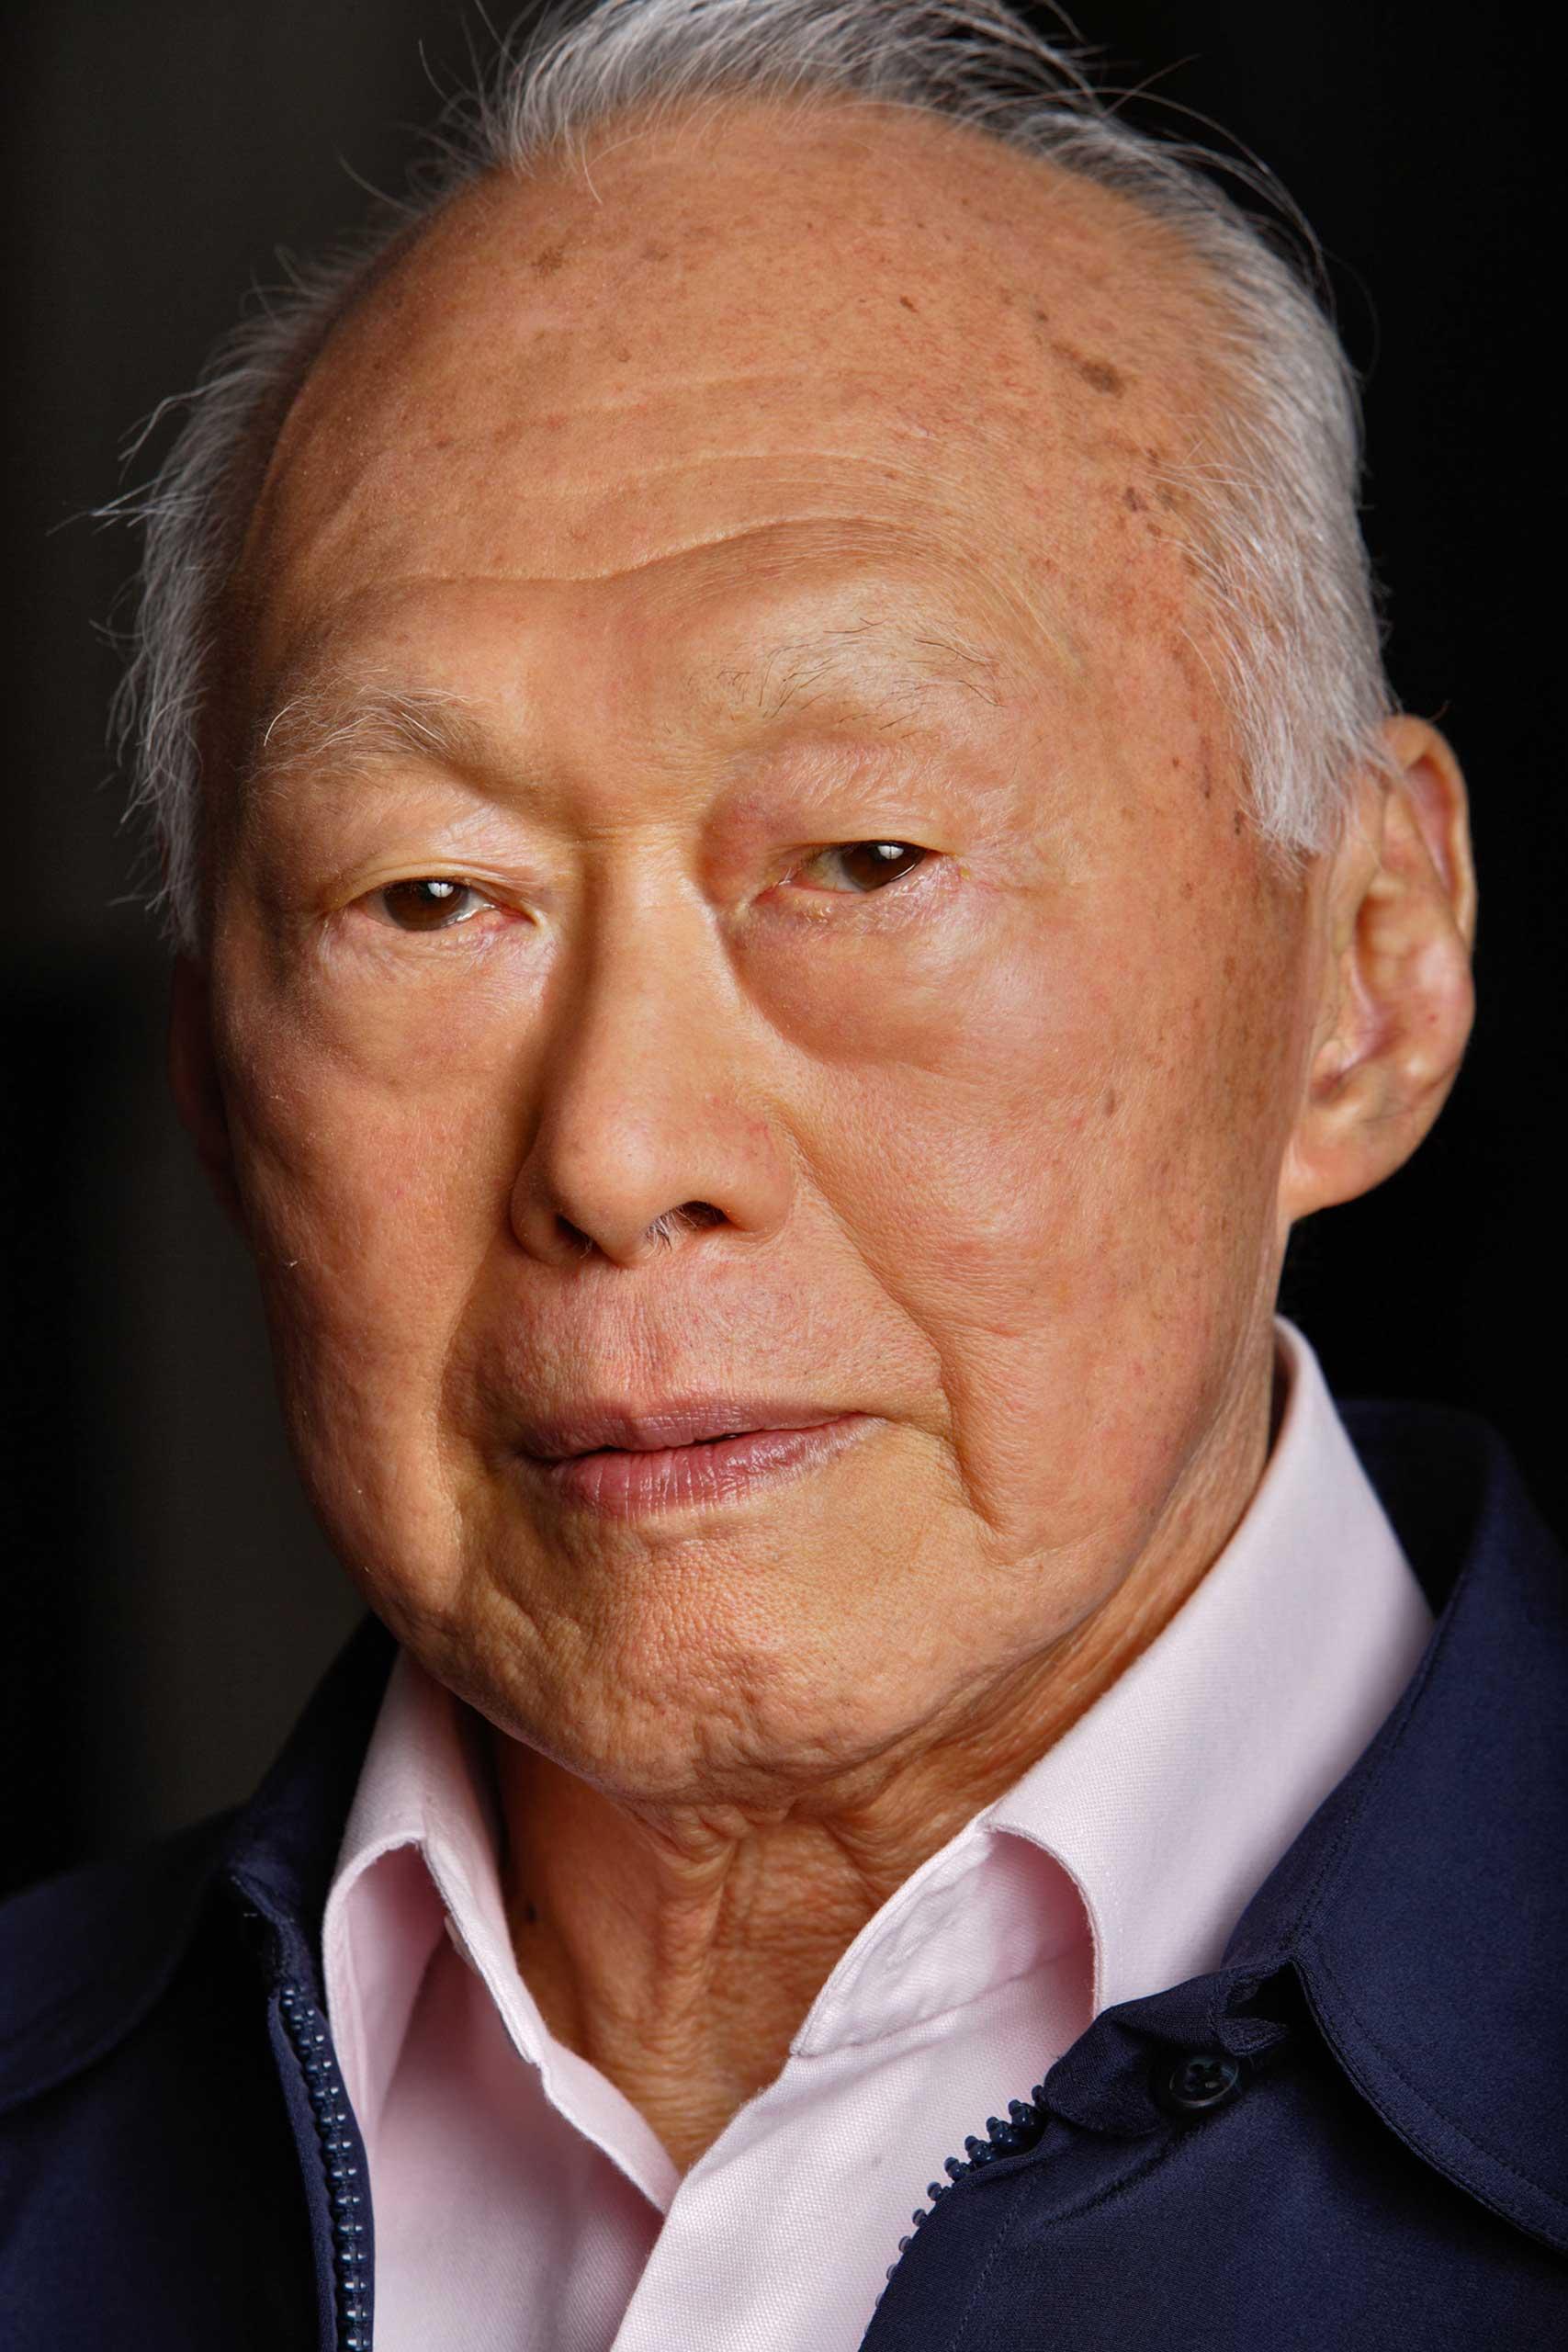 Lee Kuan Yew in 2005.